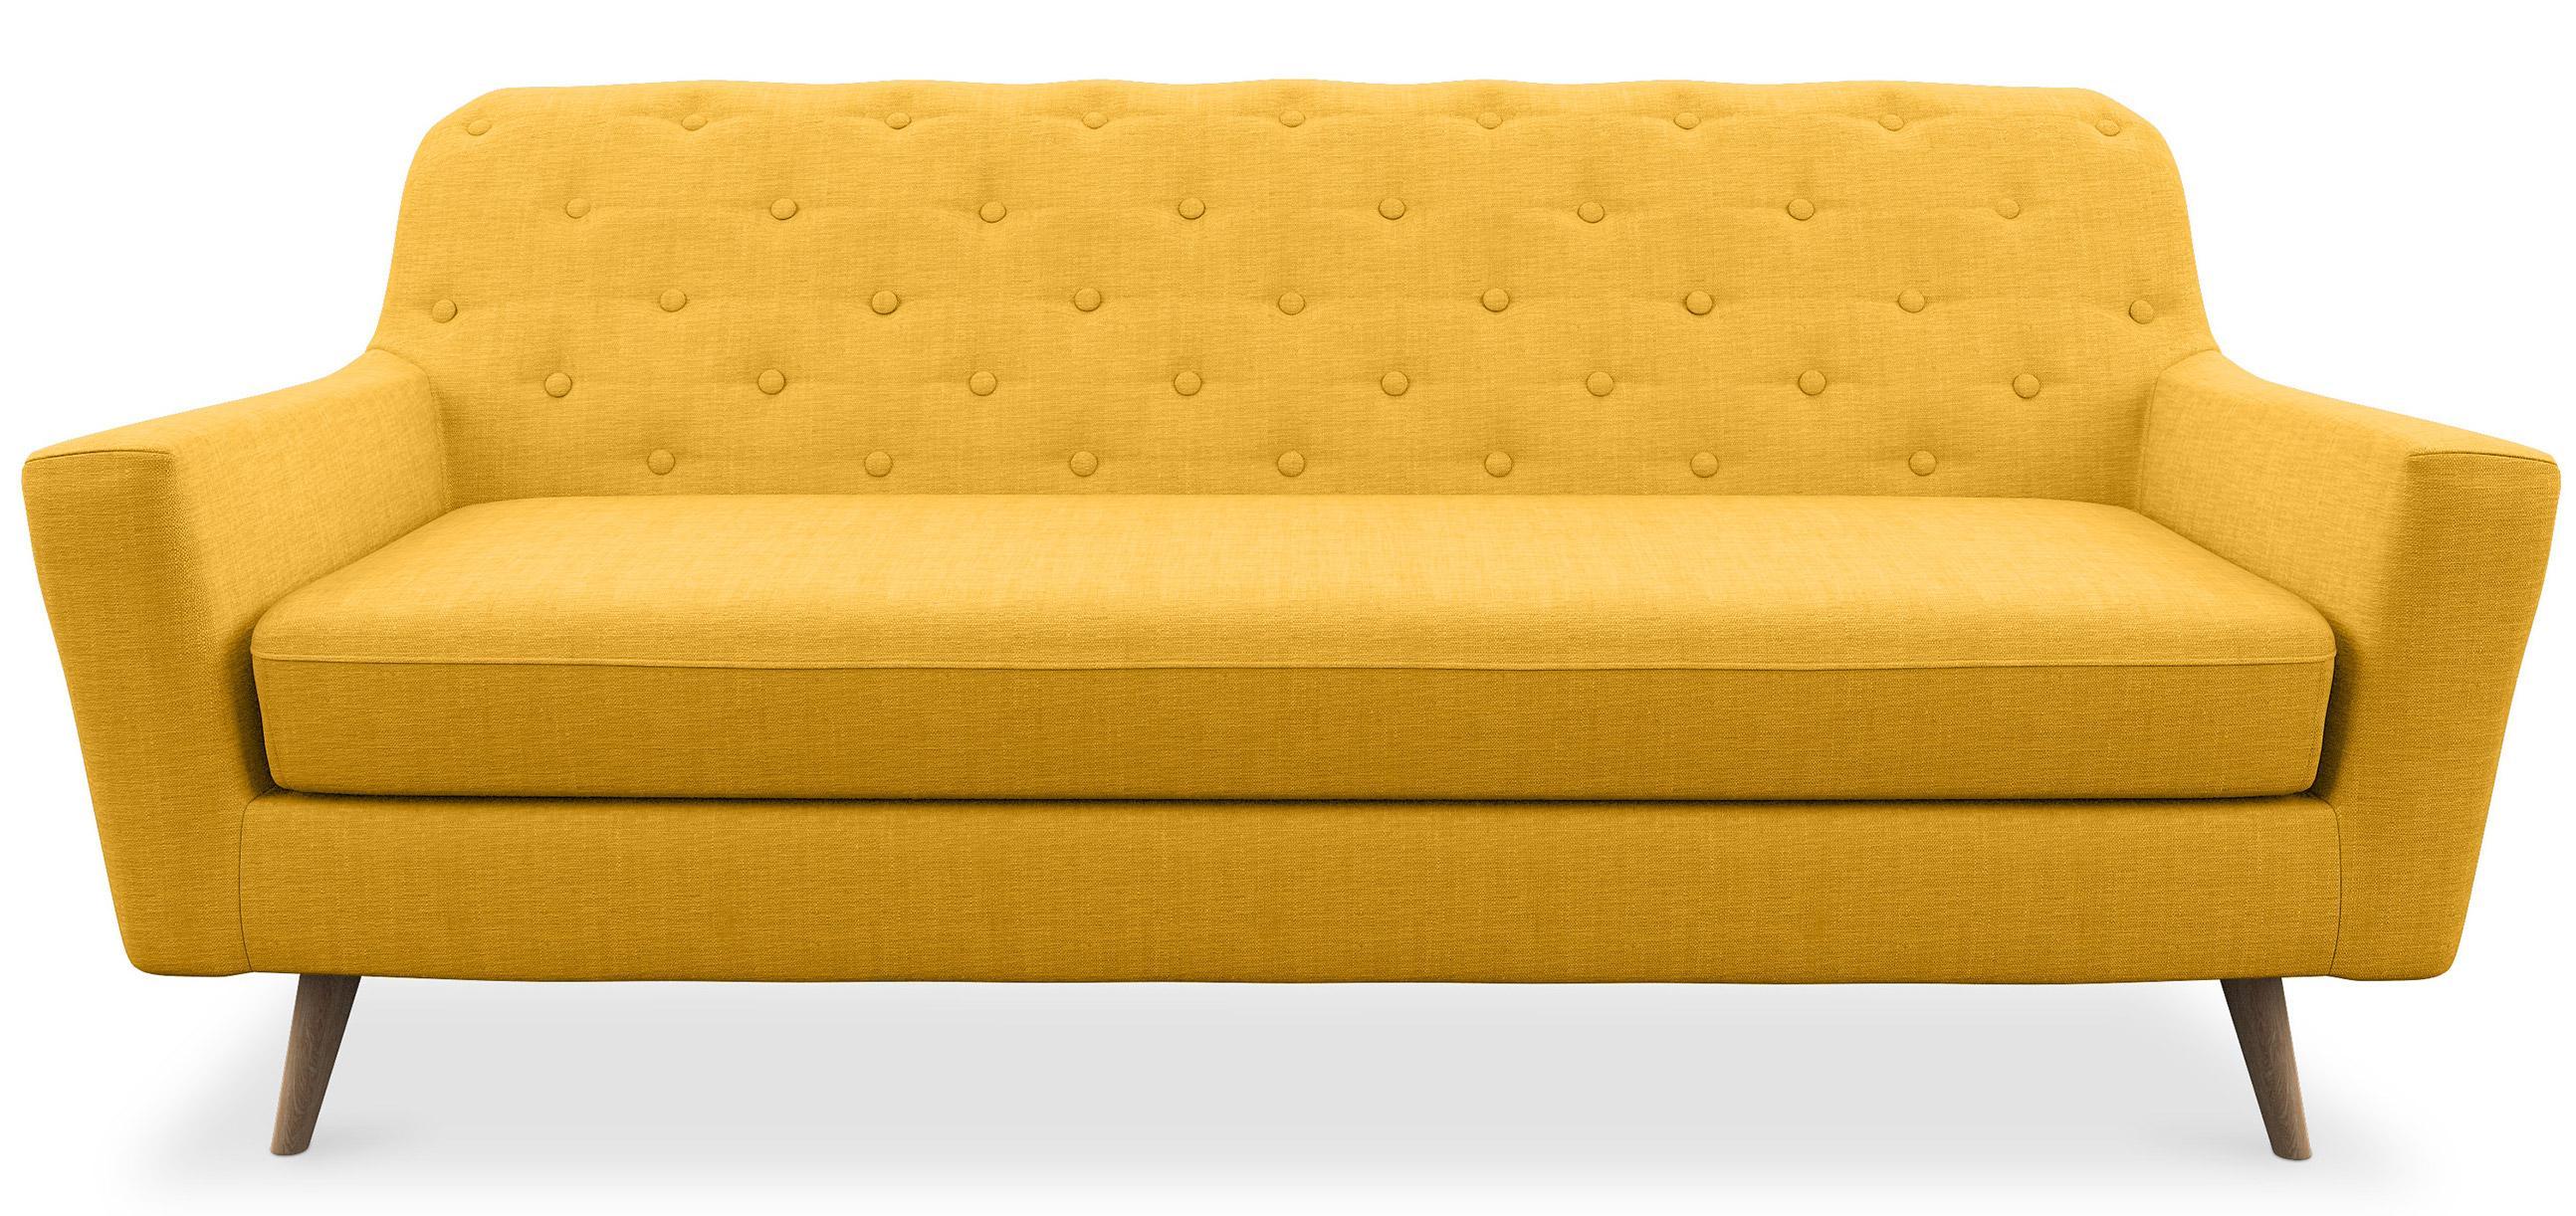 canap 3 places nordique tissu jaune norda. Black Bedroom Furniture Sets. Home Design Ideas